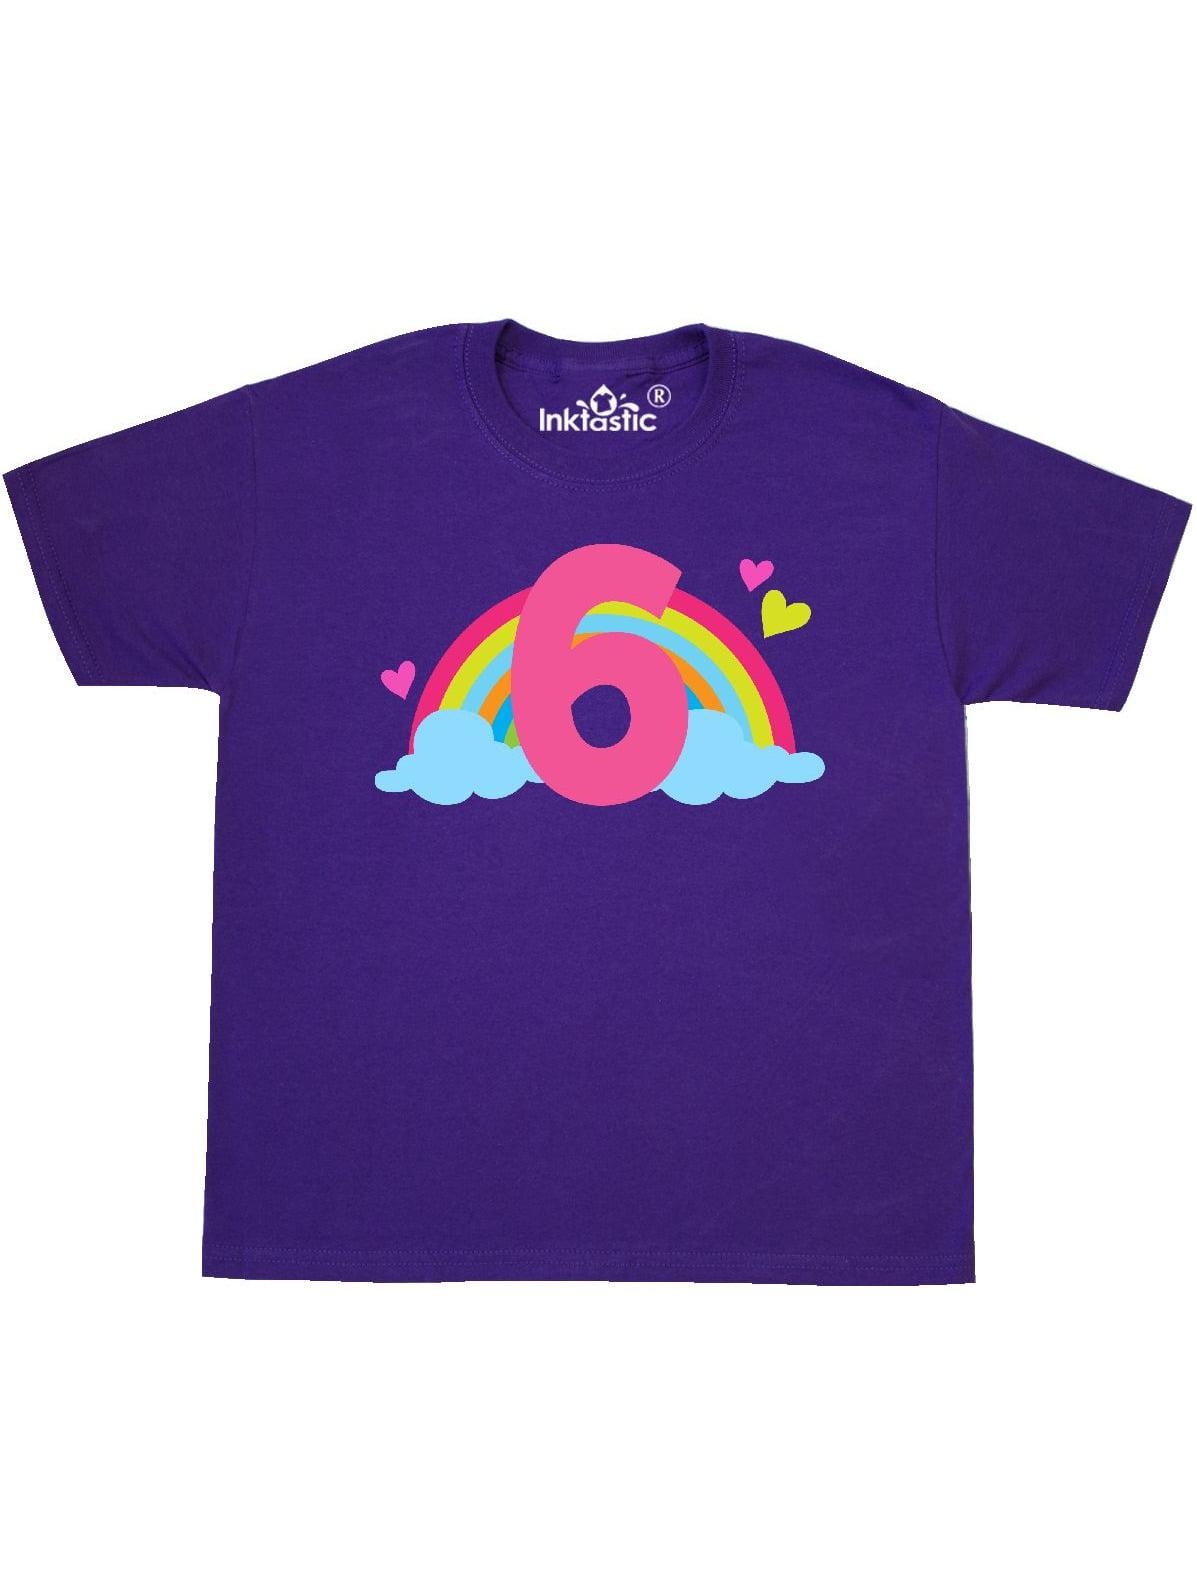 6th Birthday Rainbow Youth T-Shirt